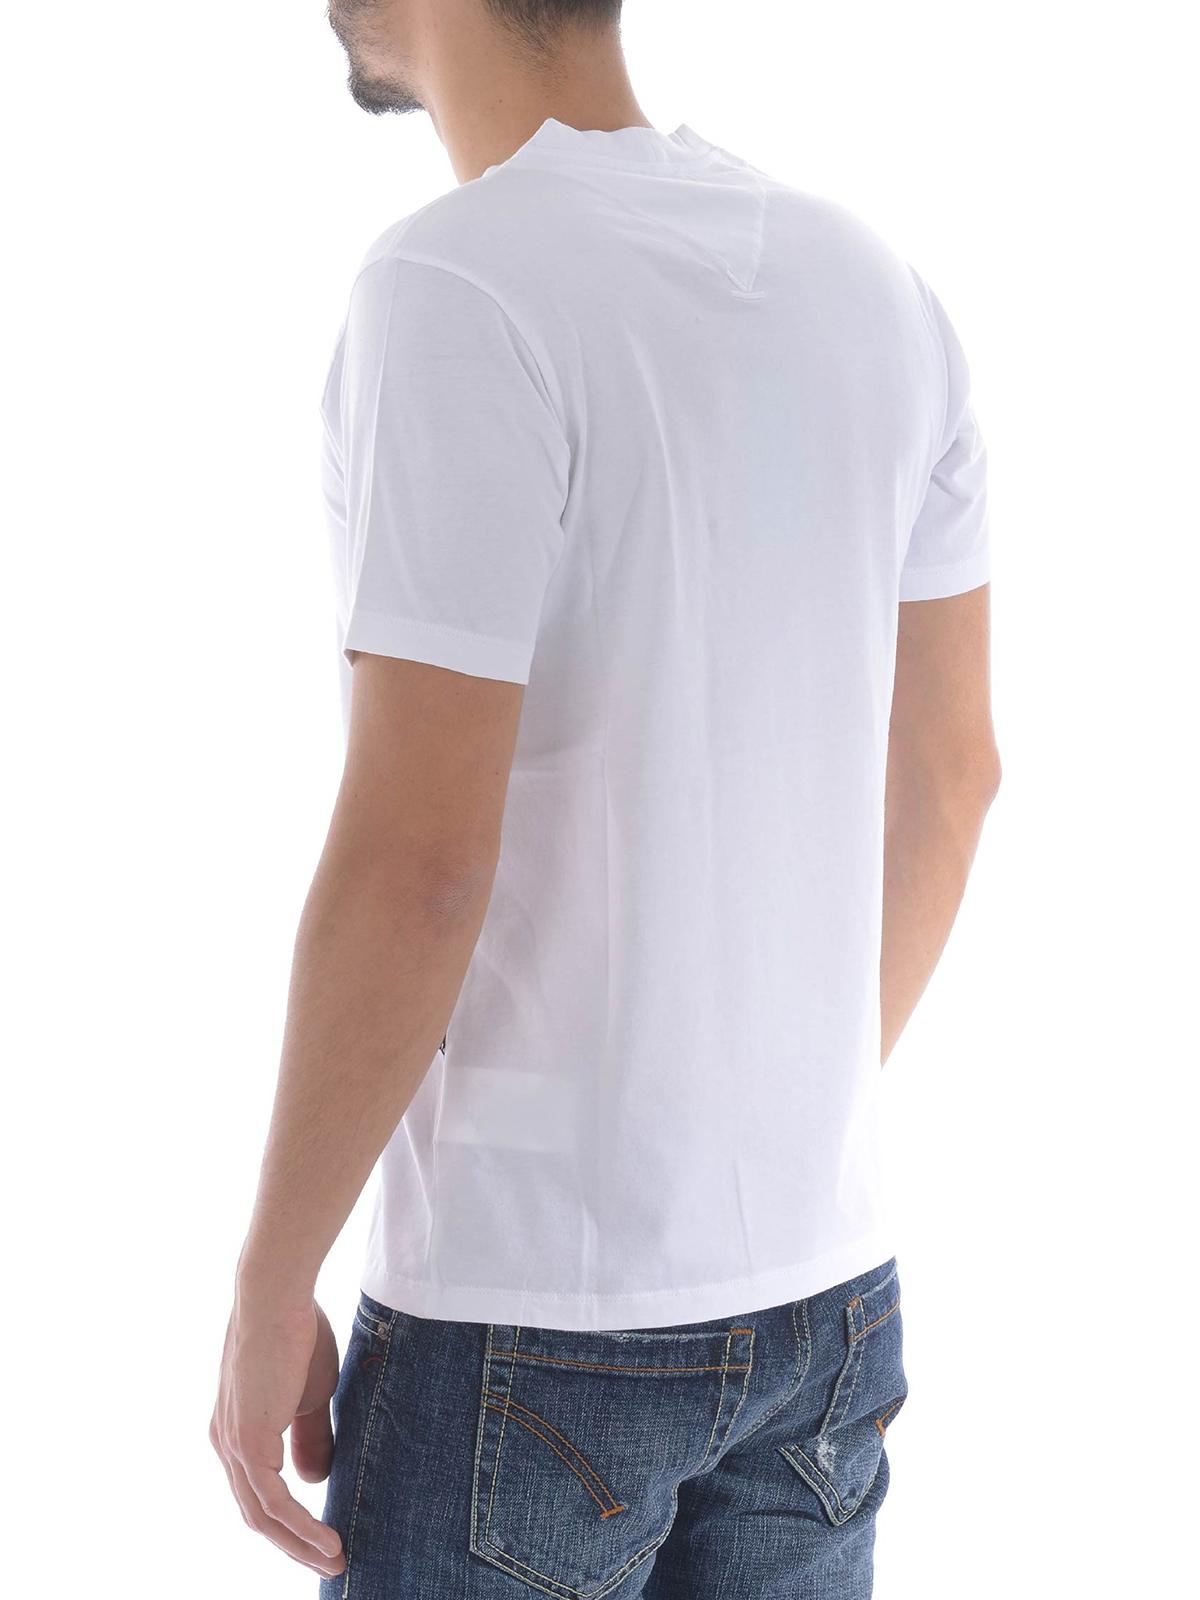 895b1ea97 Kenzo - Signature white T-shirt - t-shirts - F755TS0914SG01 | iKRIX.com